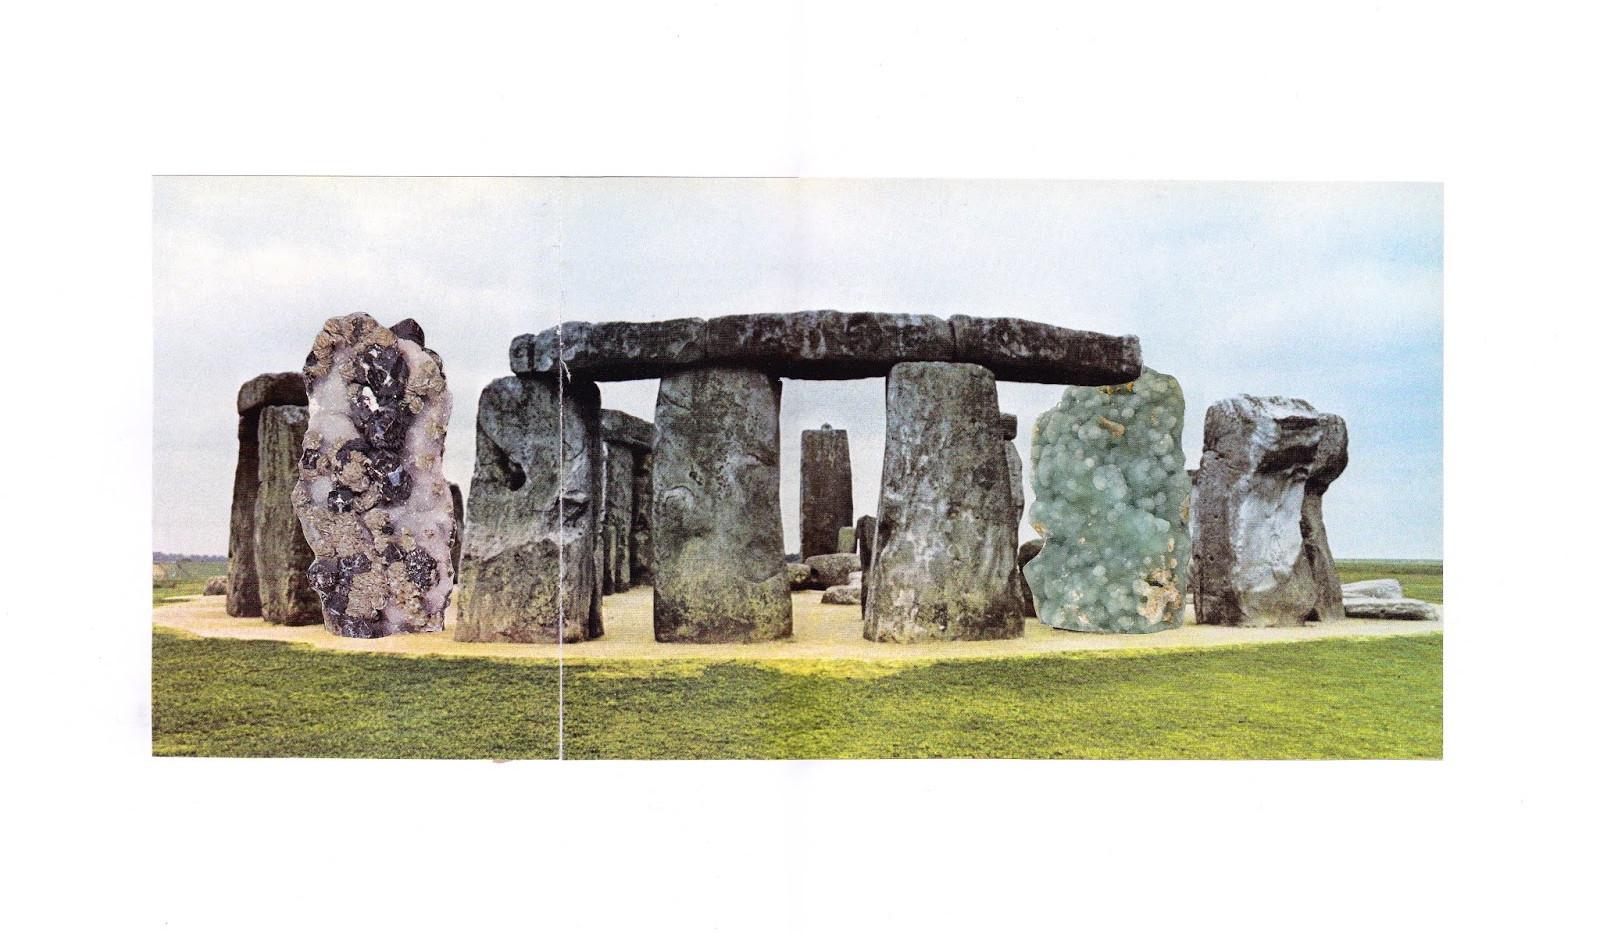 At Stone Henge